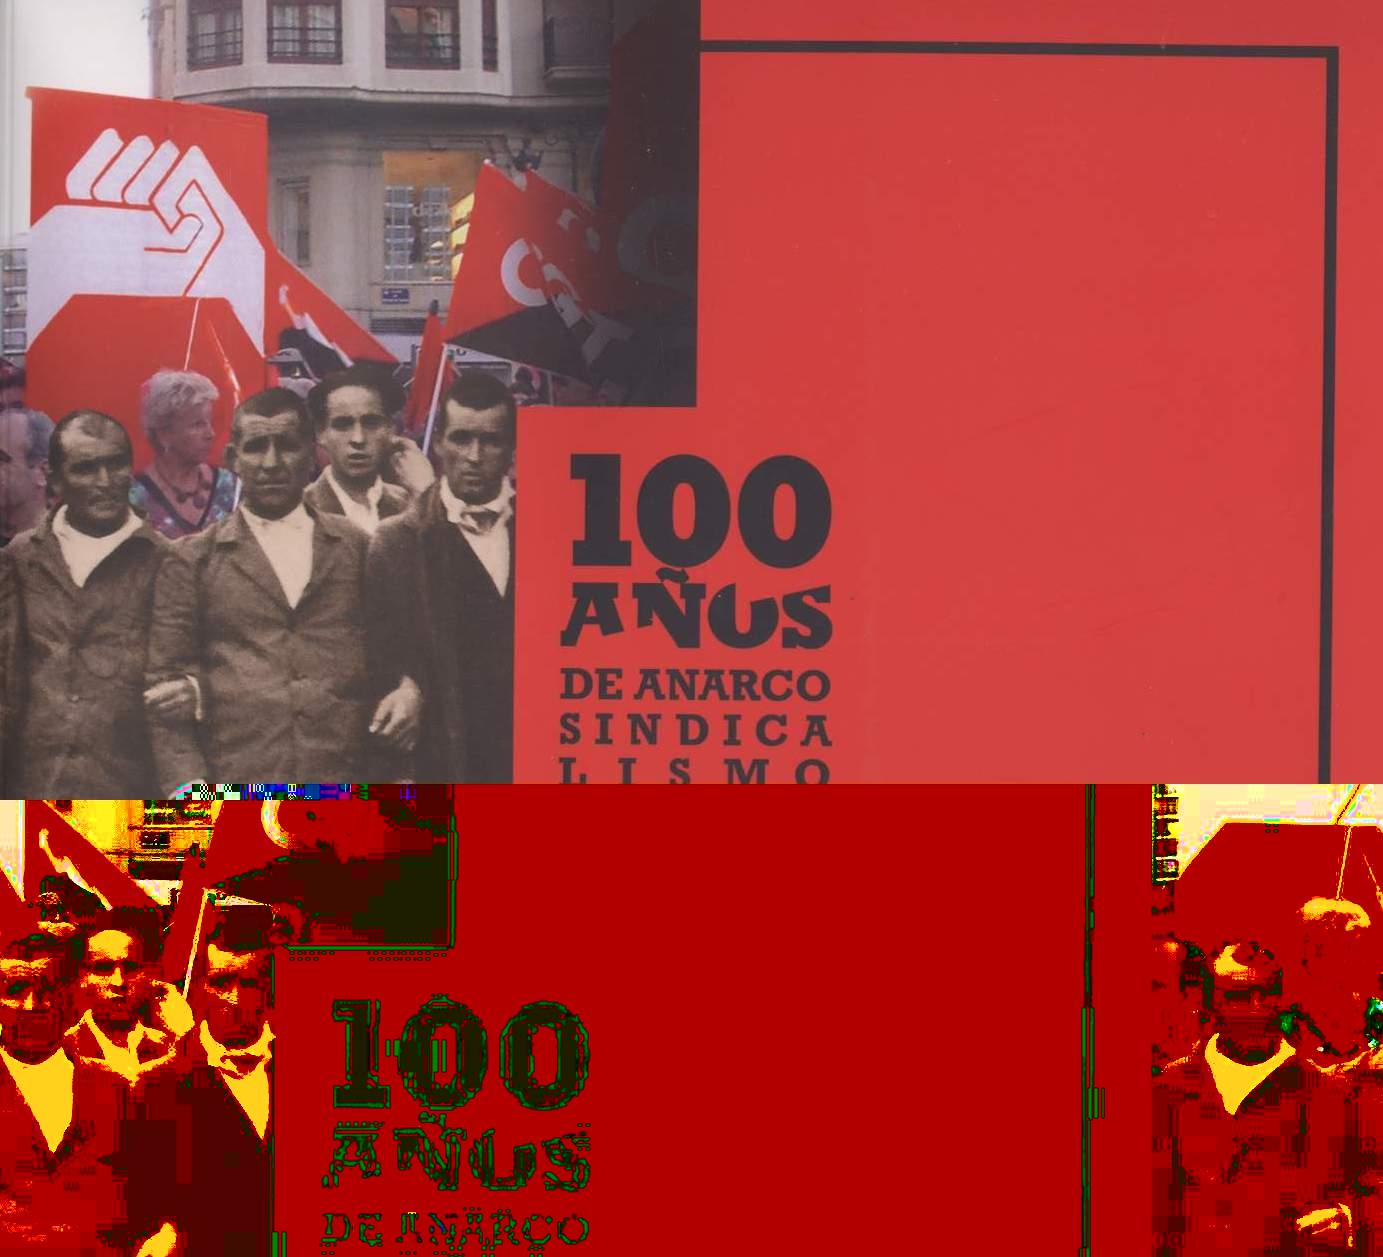 <a href='http://fundacionssegui.org/barcelona/ca/100-anos-de-anarcosindicalismo/'>100 años de anarcosindicalismo</a>